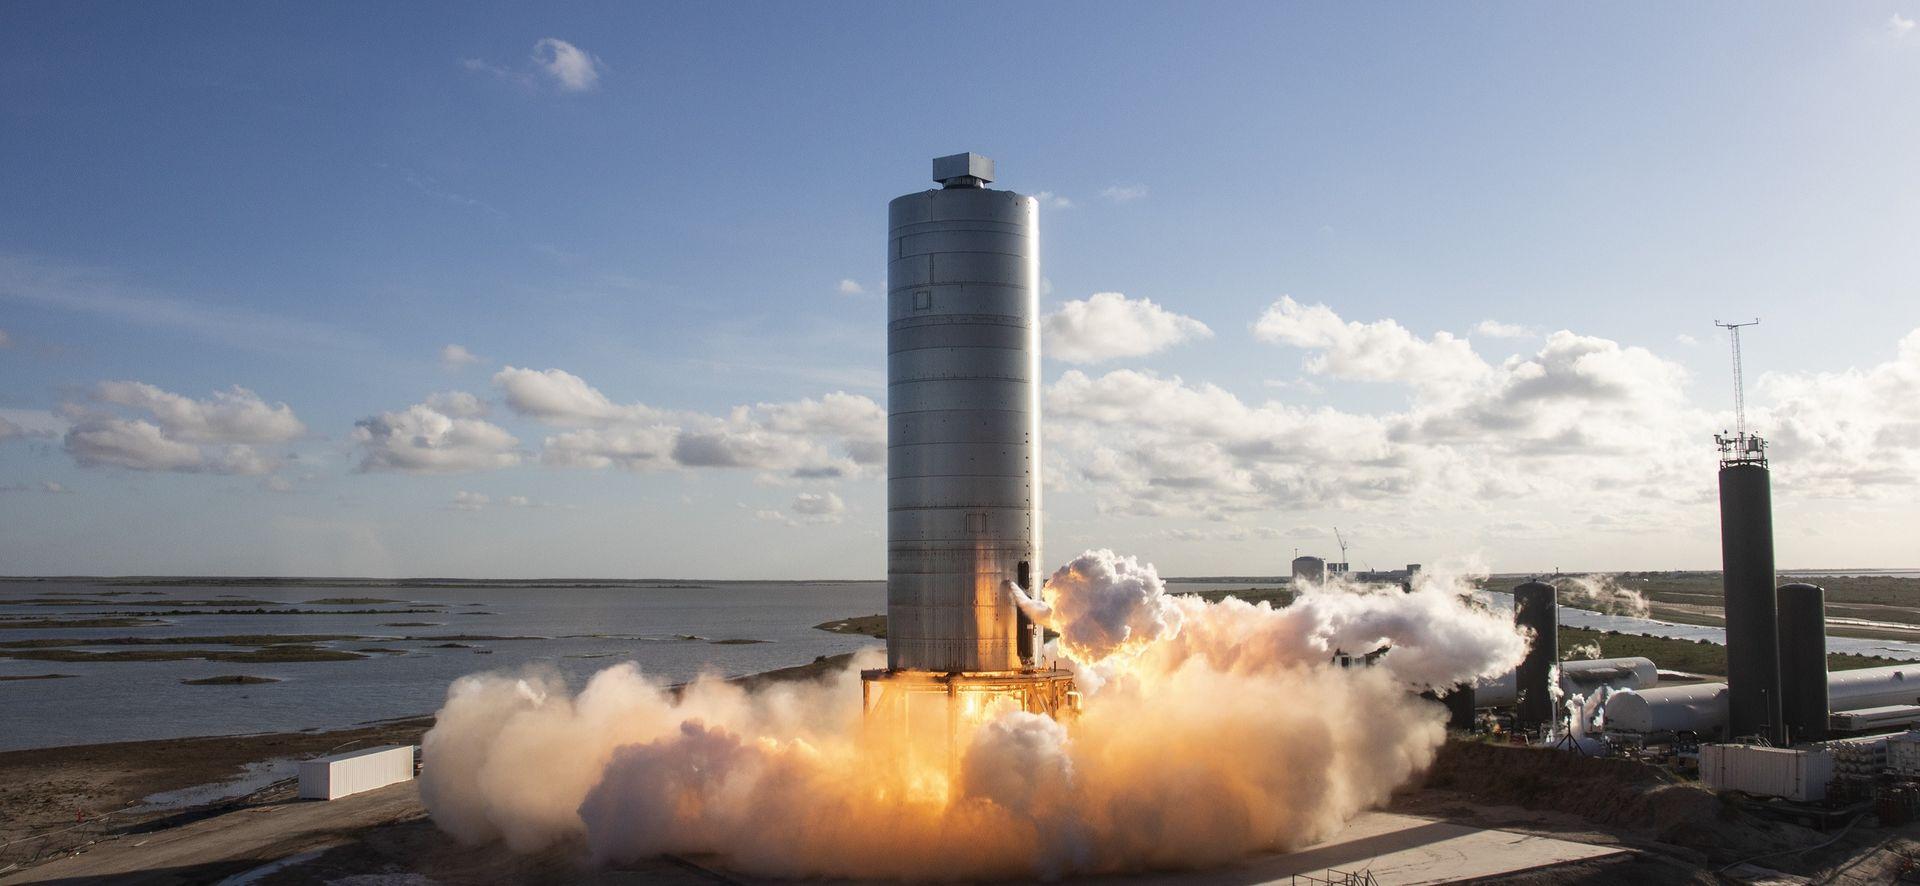 SpaceX Starship-prototyp tar sig upp i luften